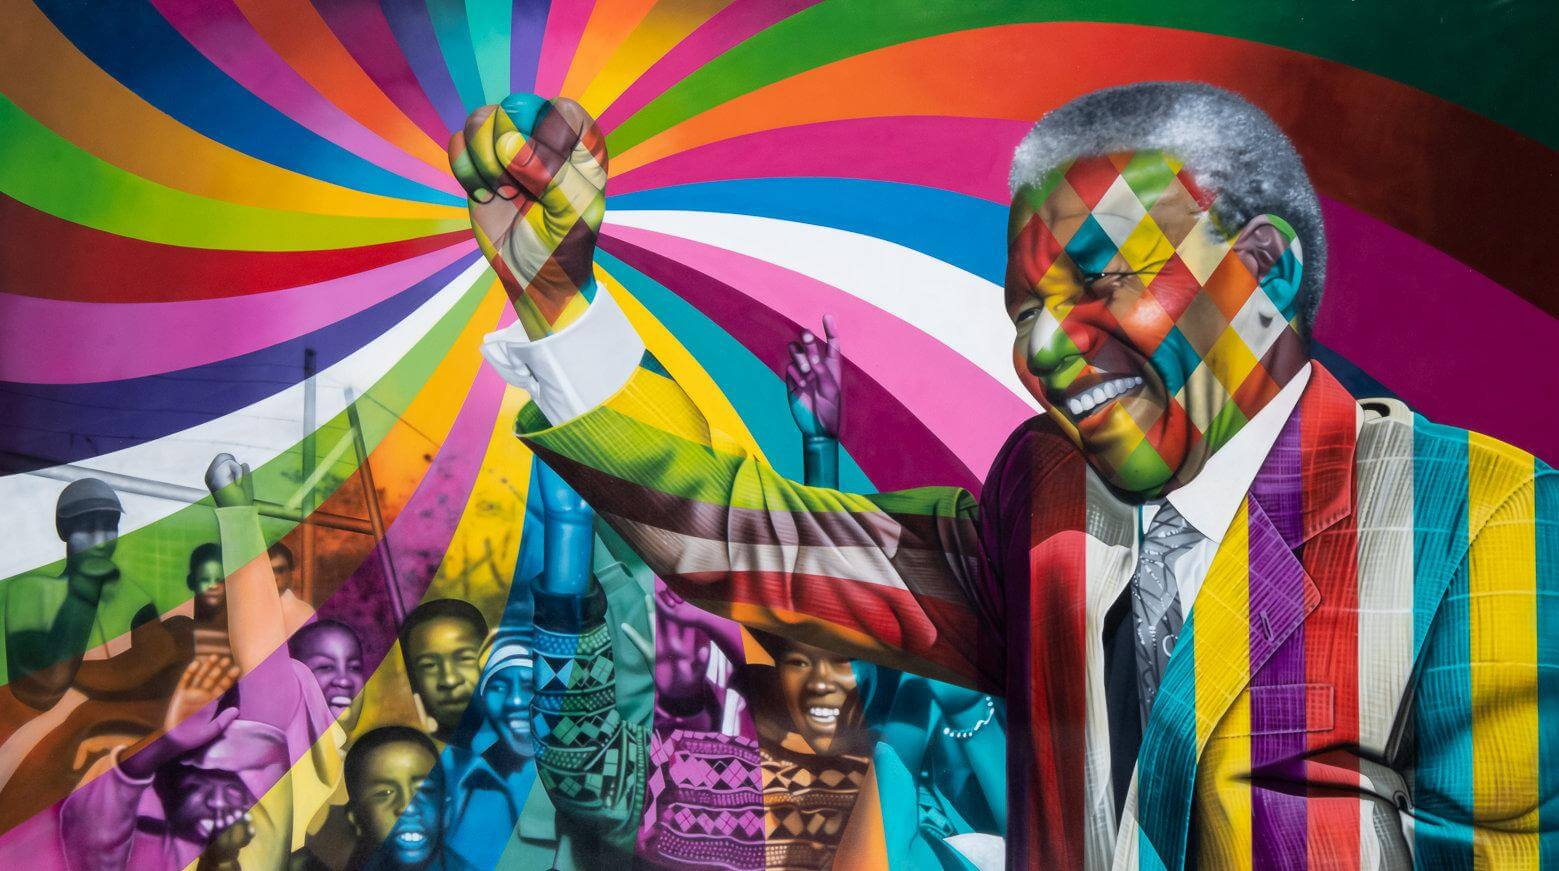 Mandela - Eduardo Kobra - Eden Gallery